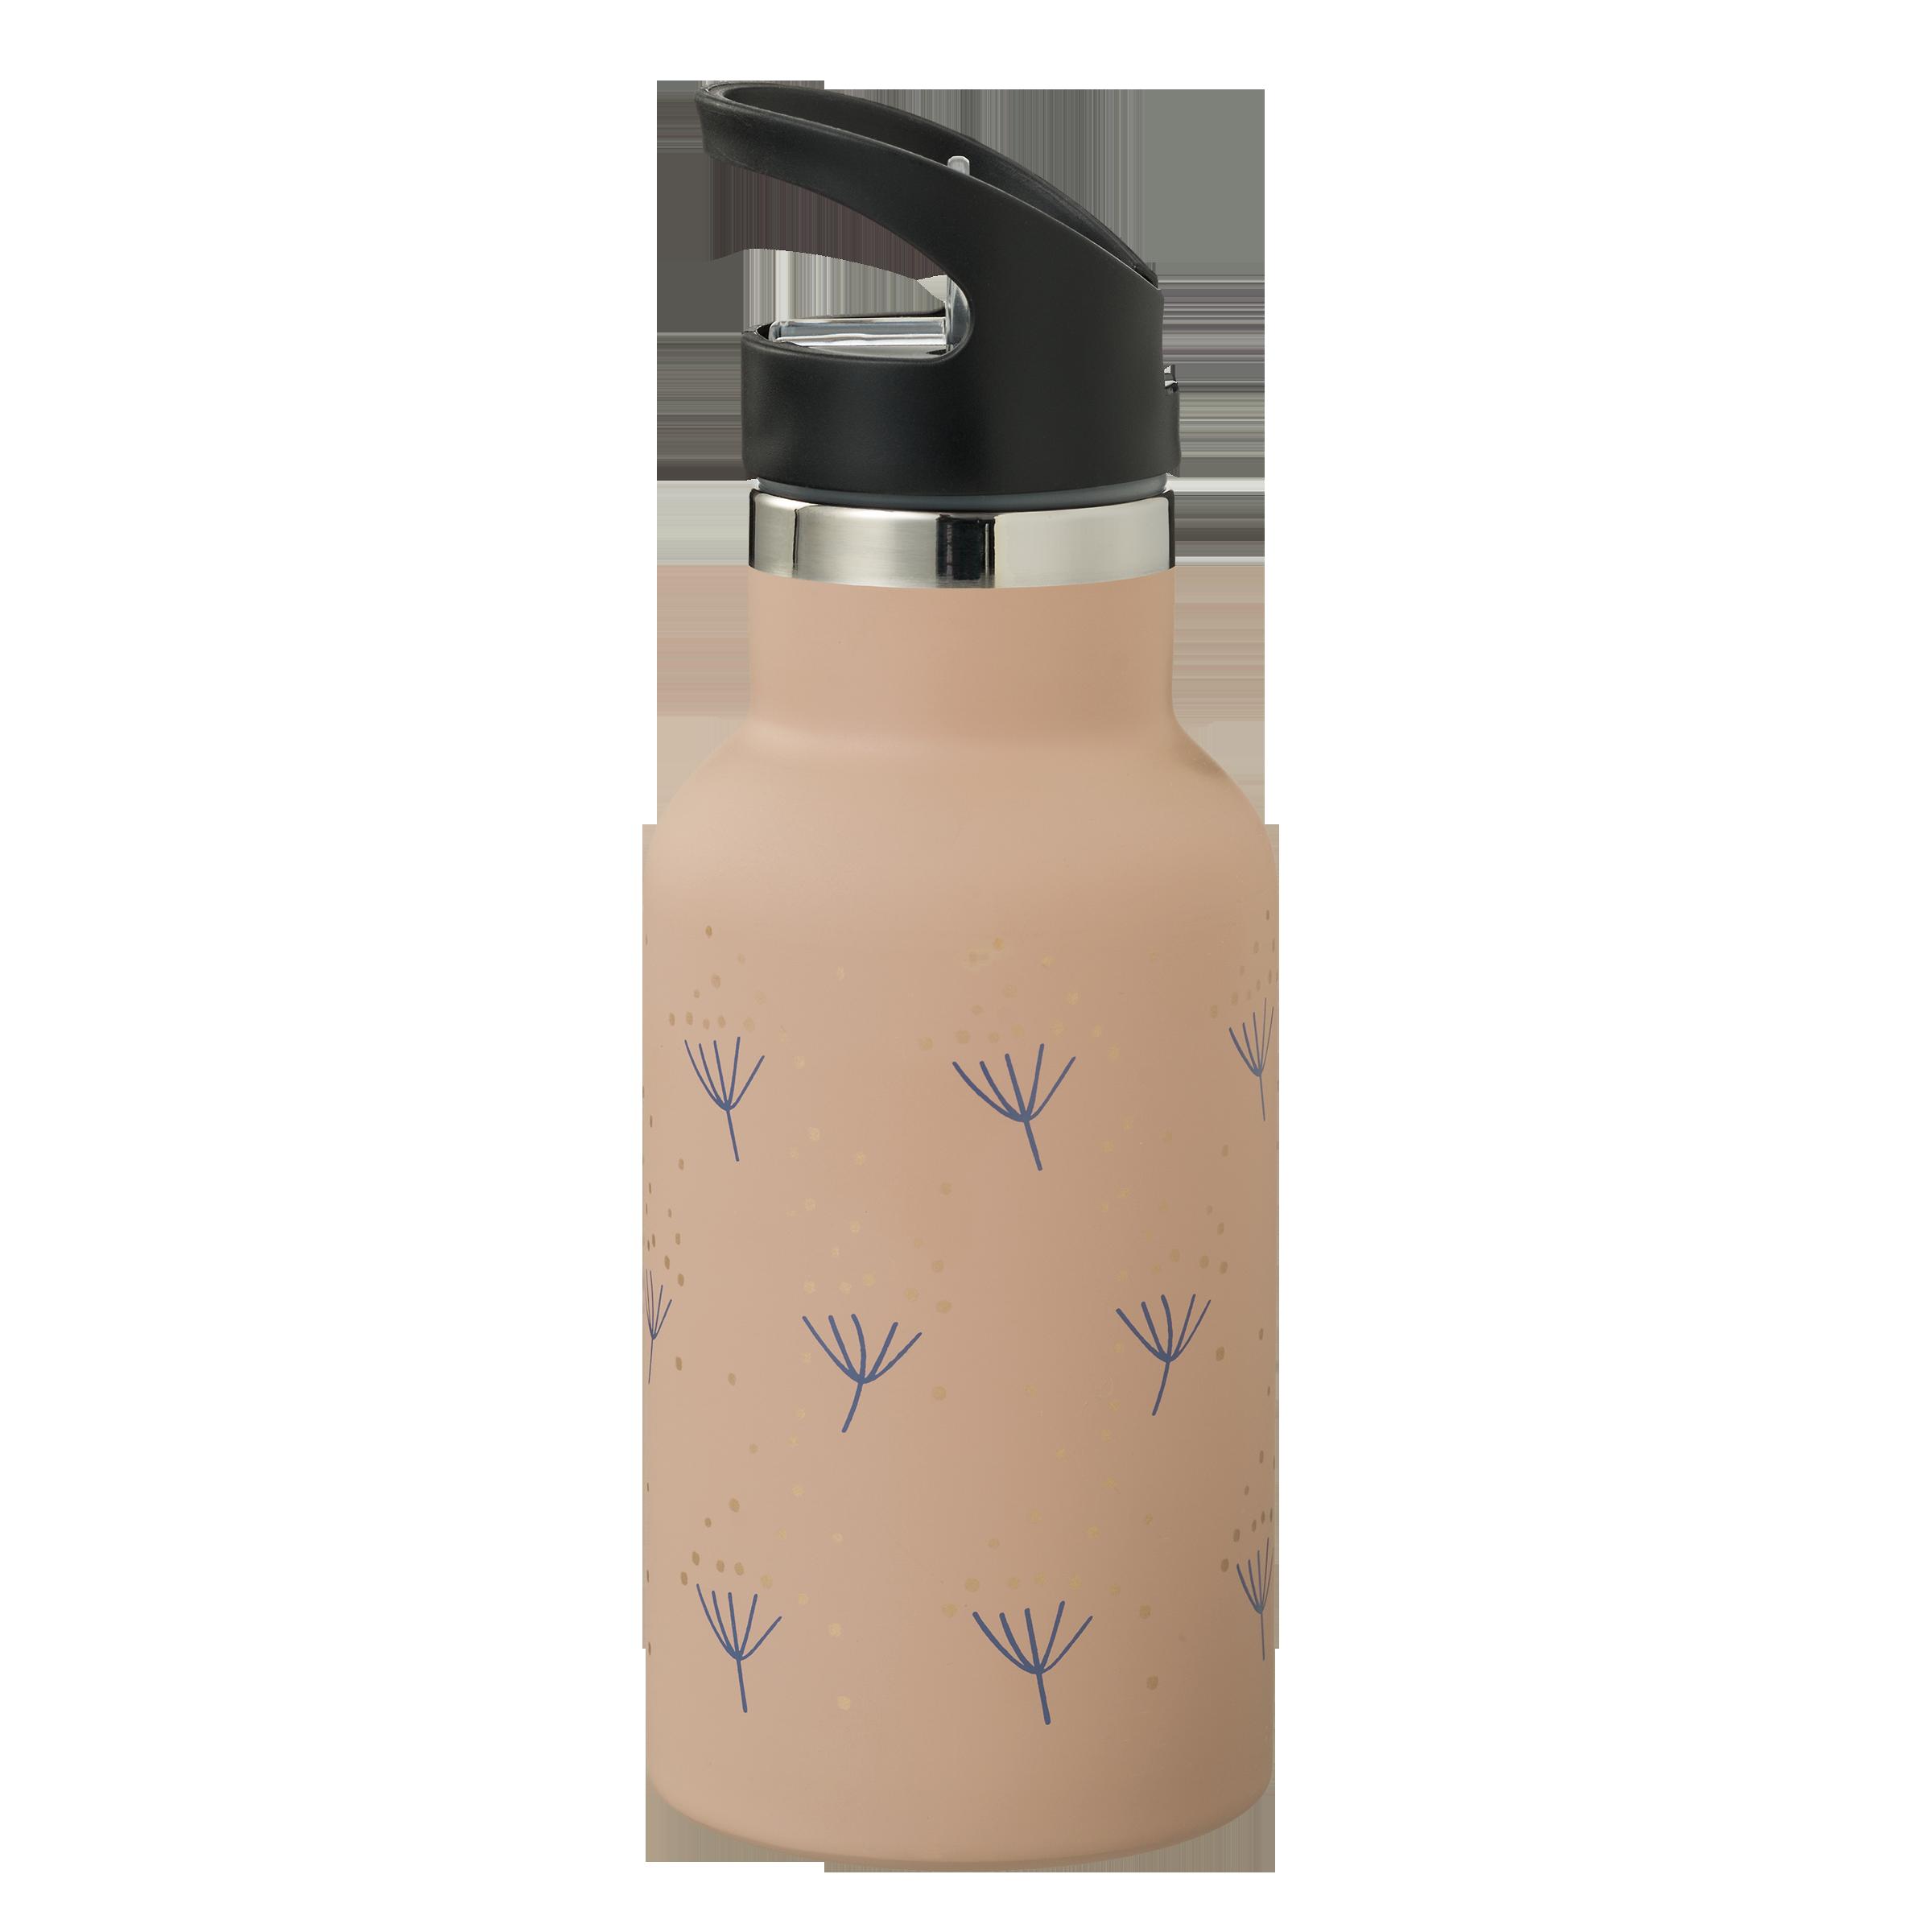 Afbeelding Fresk Thermische drinkfles I Dandelion